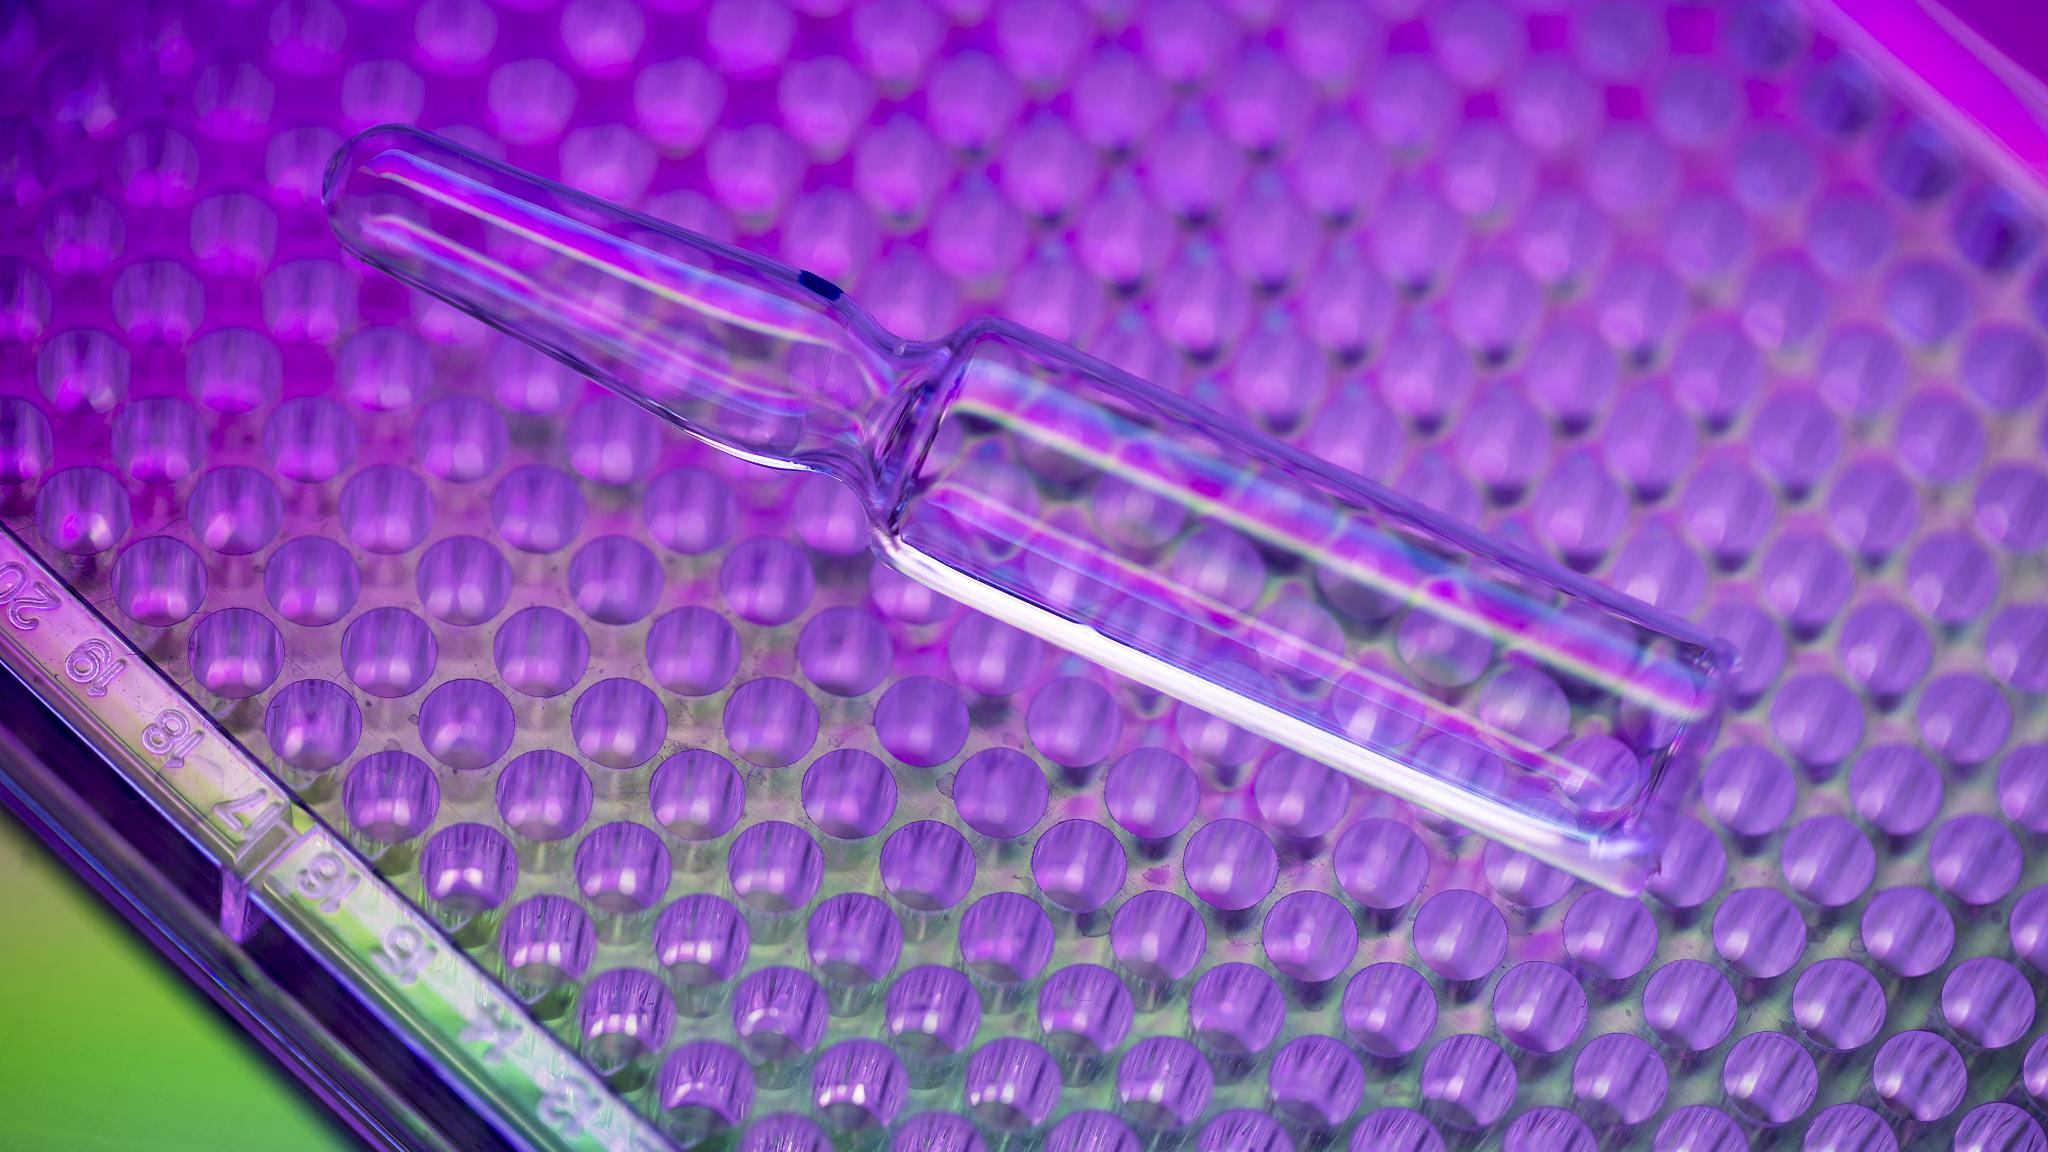 China's nasal-spray COVID-19 vaccines undergoing clinical trials - CGTN